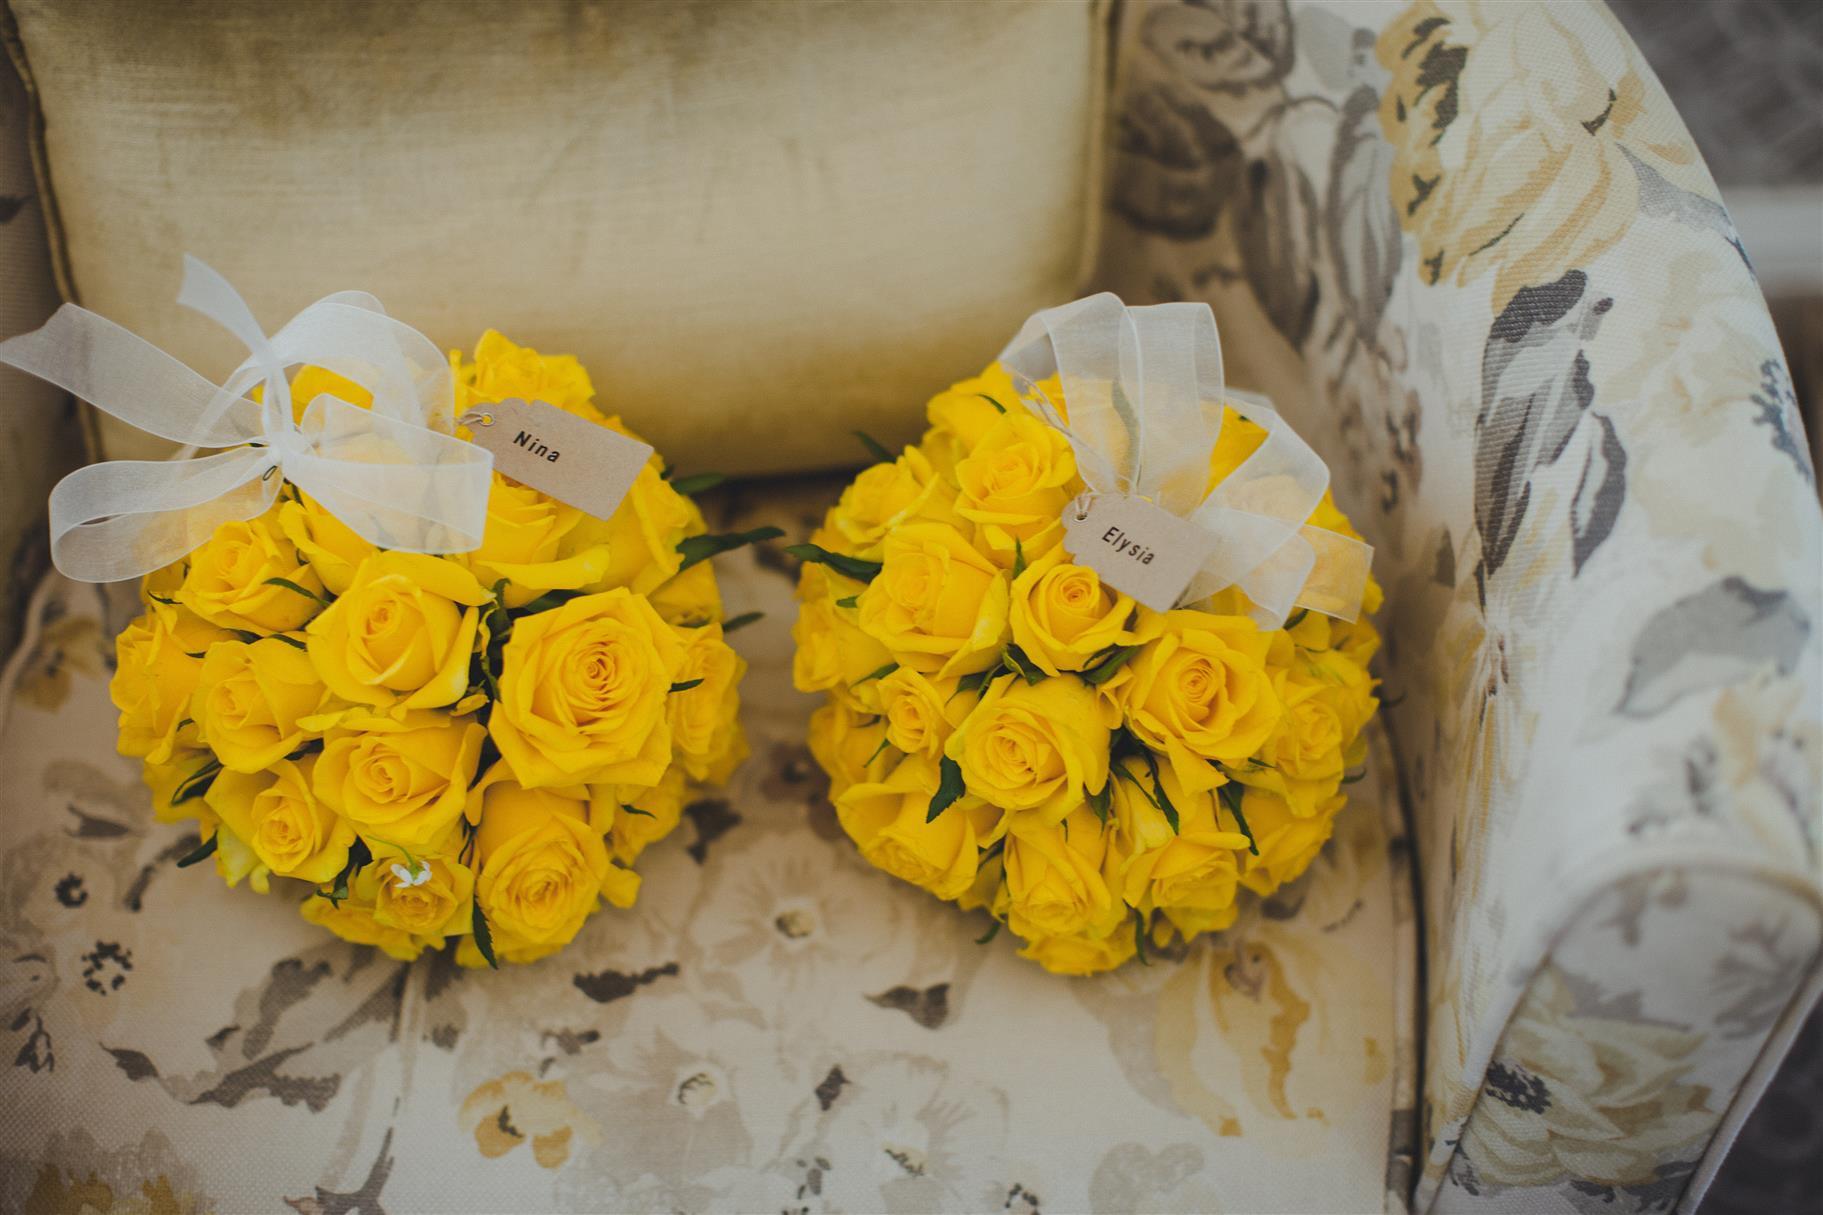 Flower Girl Pomander Bouquets - A Spring 1960s Inspired Wedding